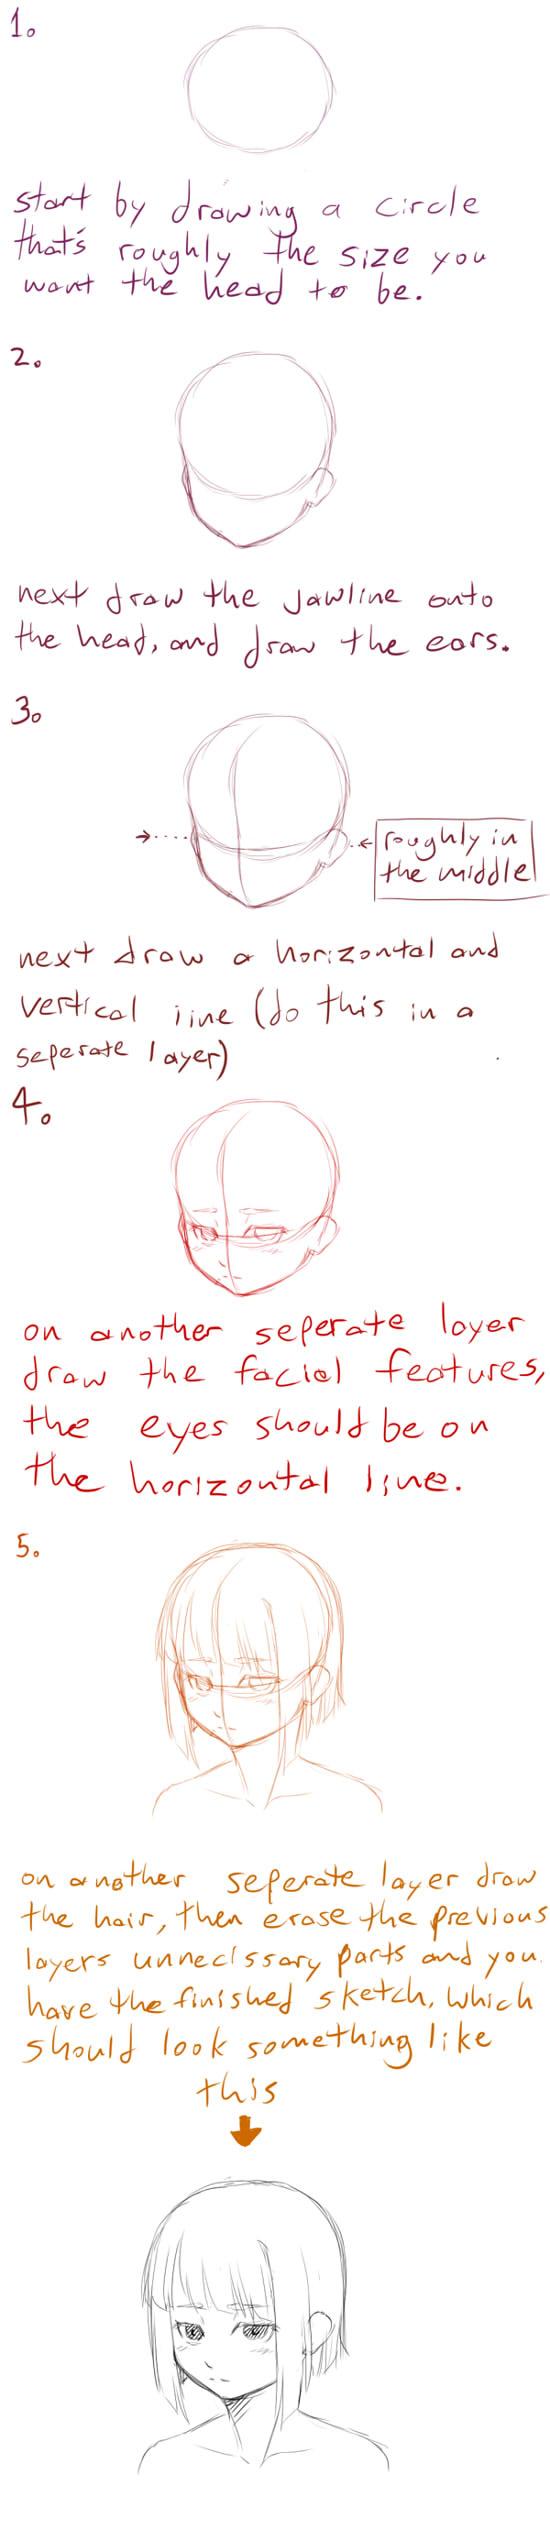 manga style faces: tutorial 1